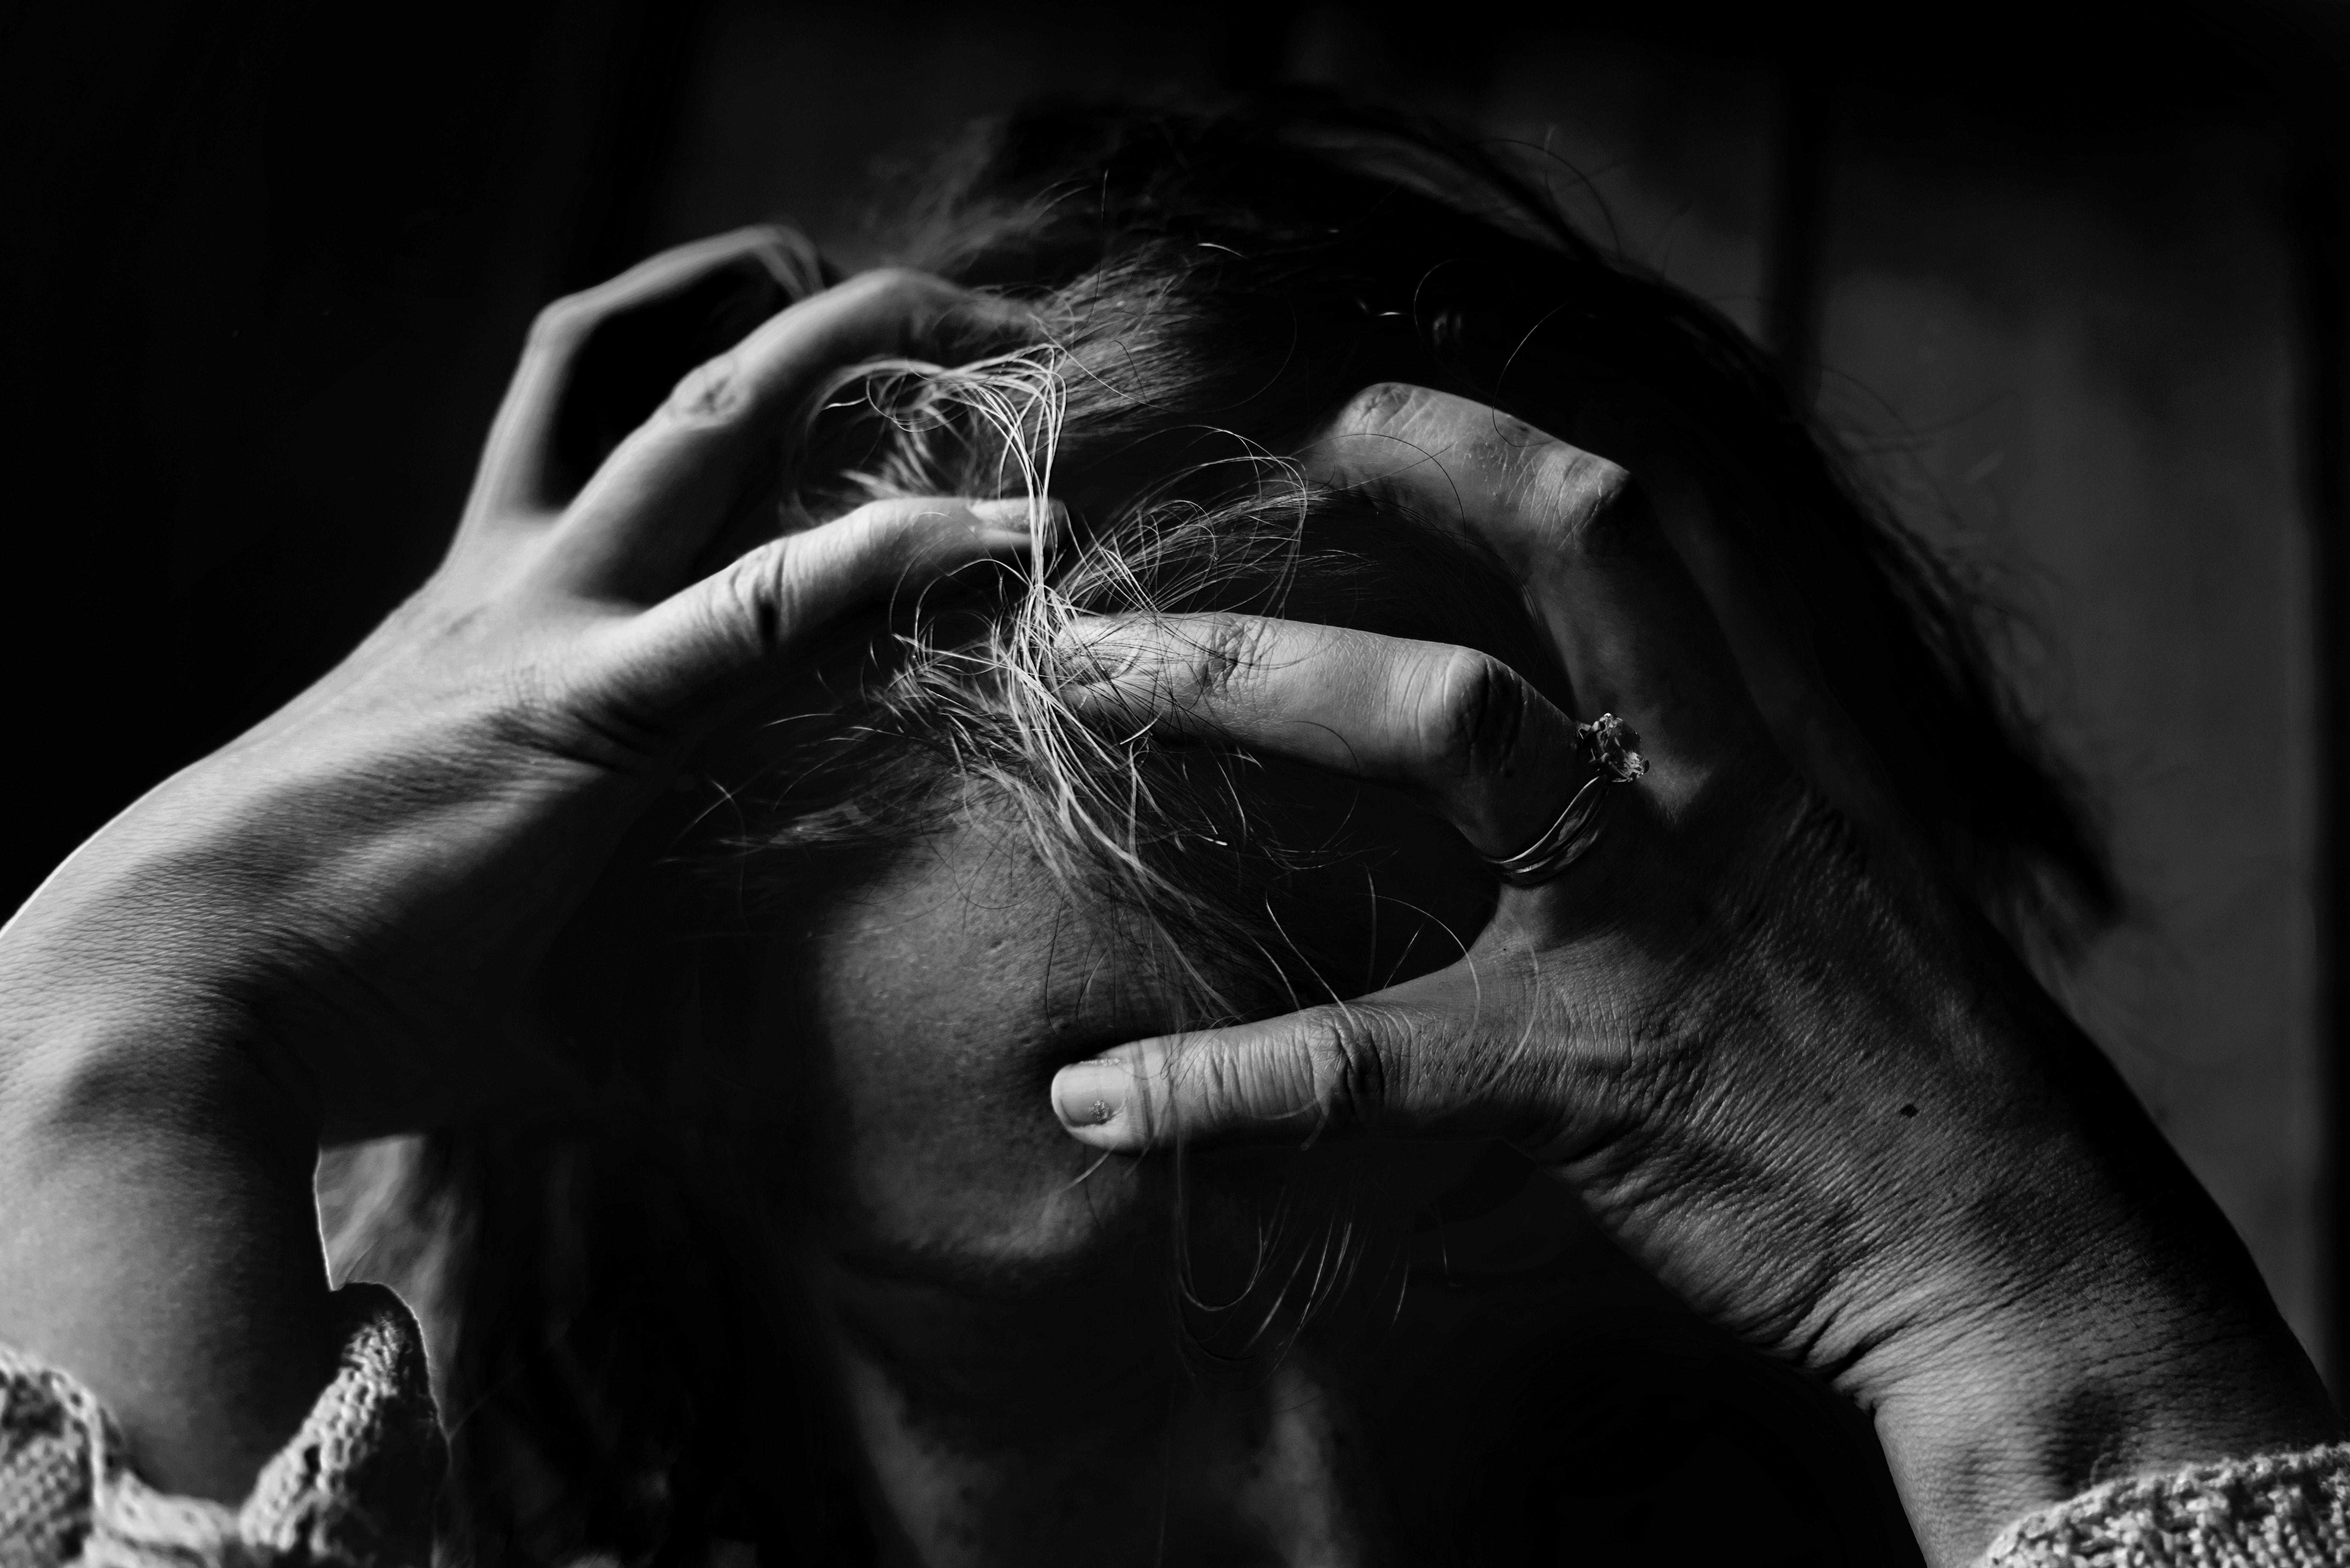 Tras pandemia de Covid-19 vendrá crisis global de salud mental, advierten